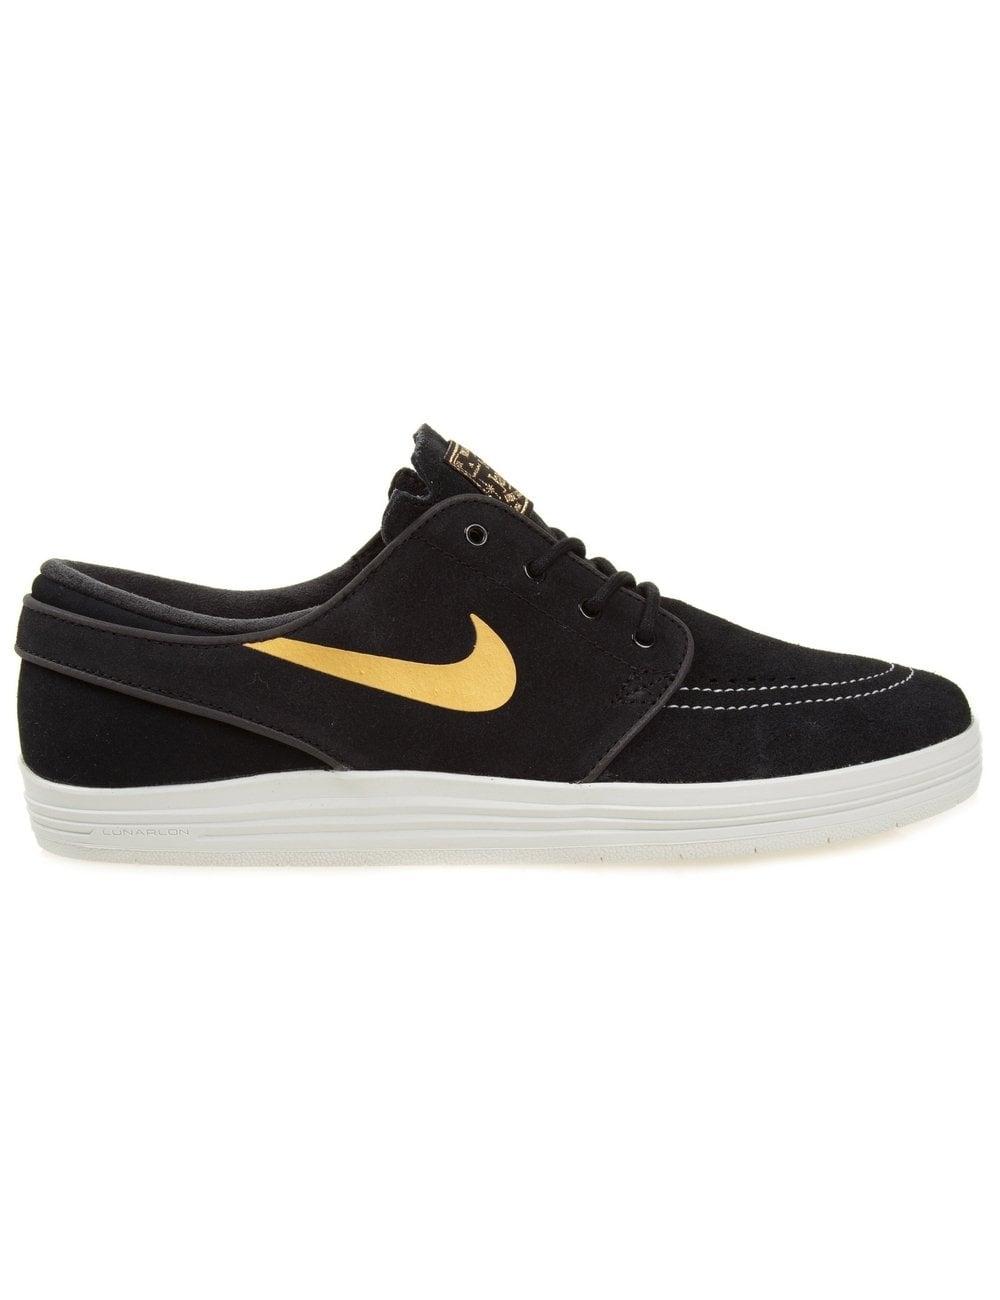 e2565cf0f8b5 Nike SB Lunar Stefan Janoski - Black Gold - Footwear from Fat Buddha ...